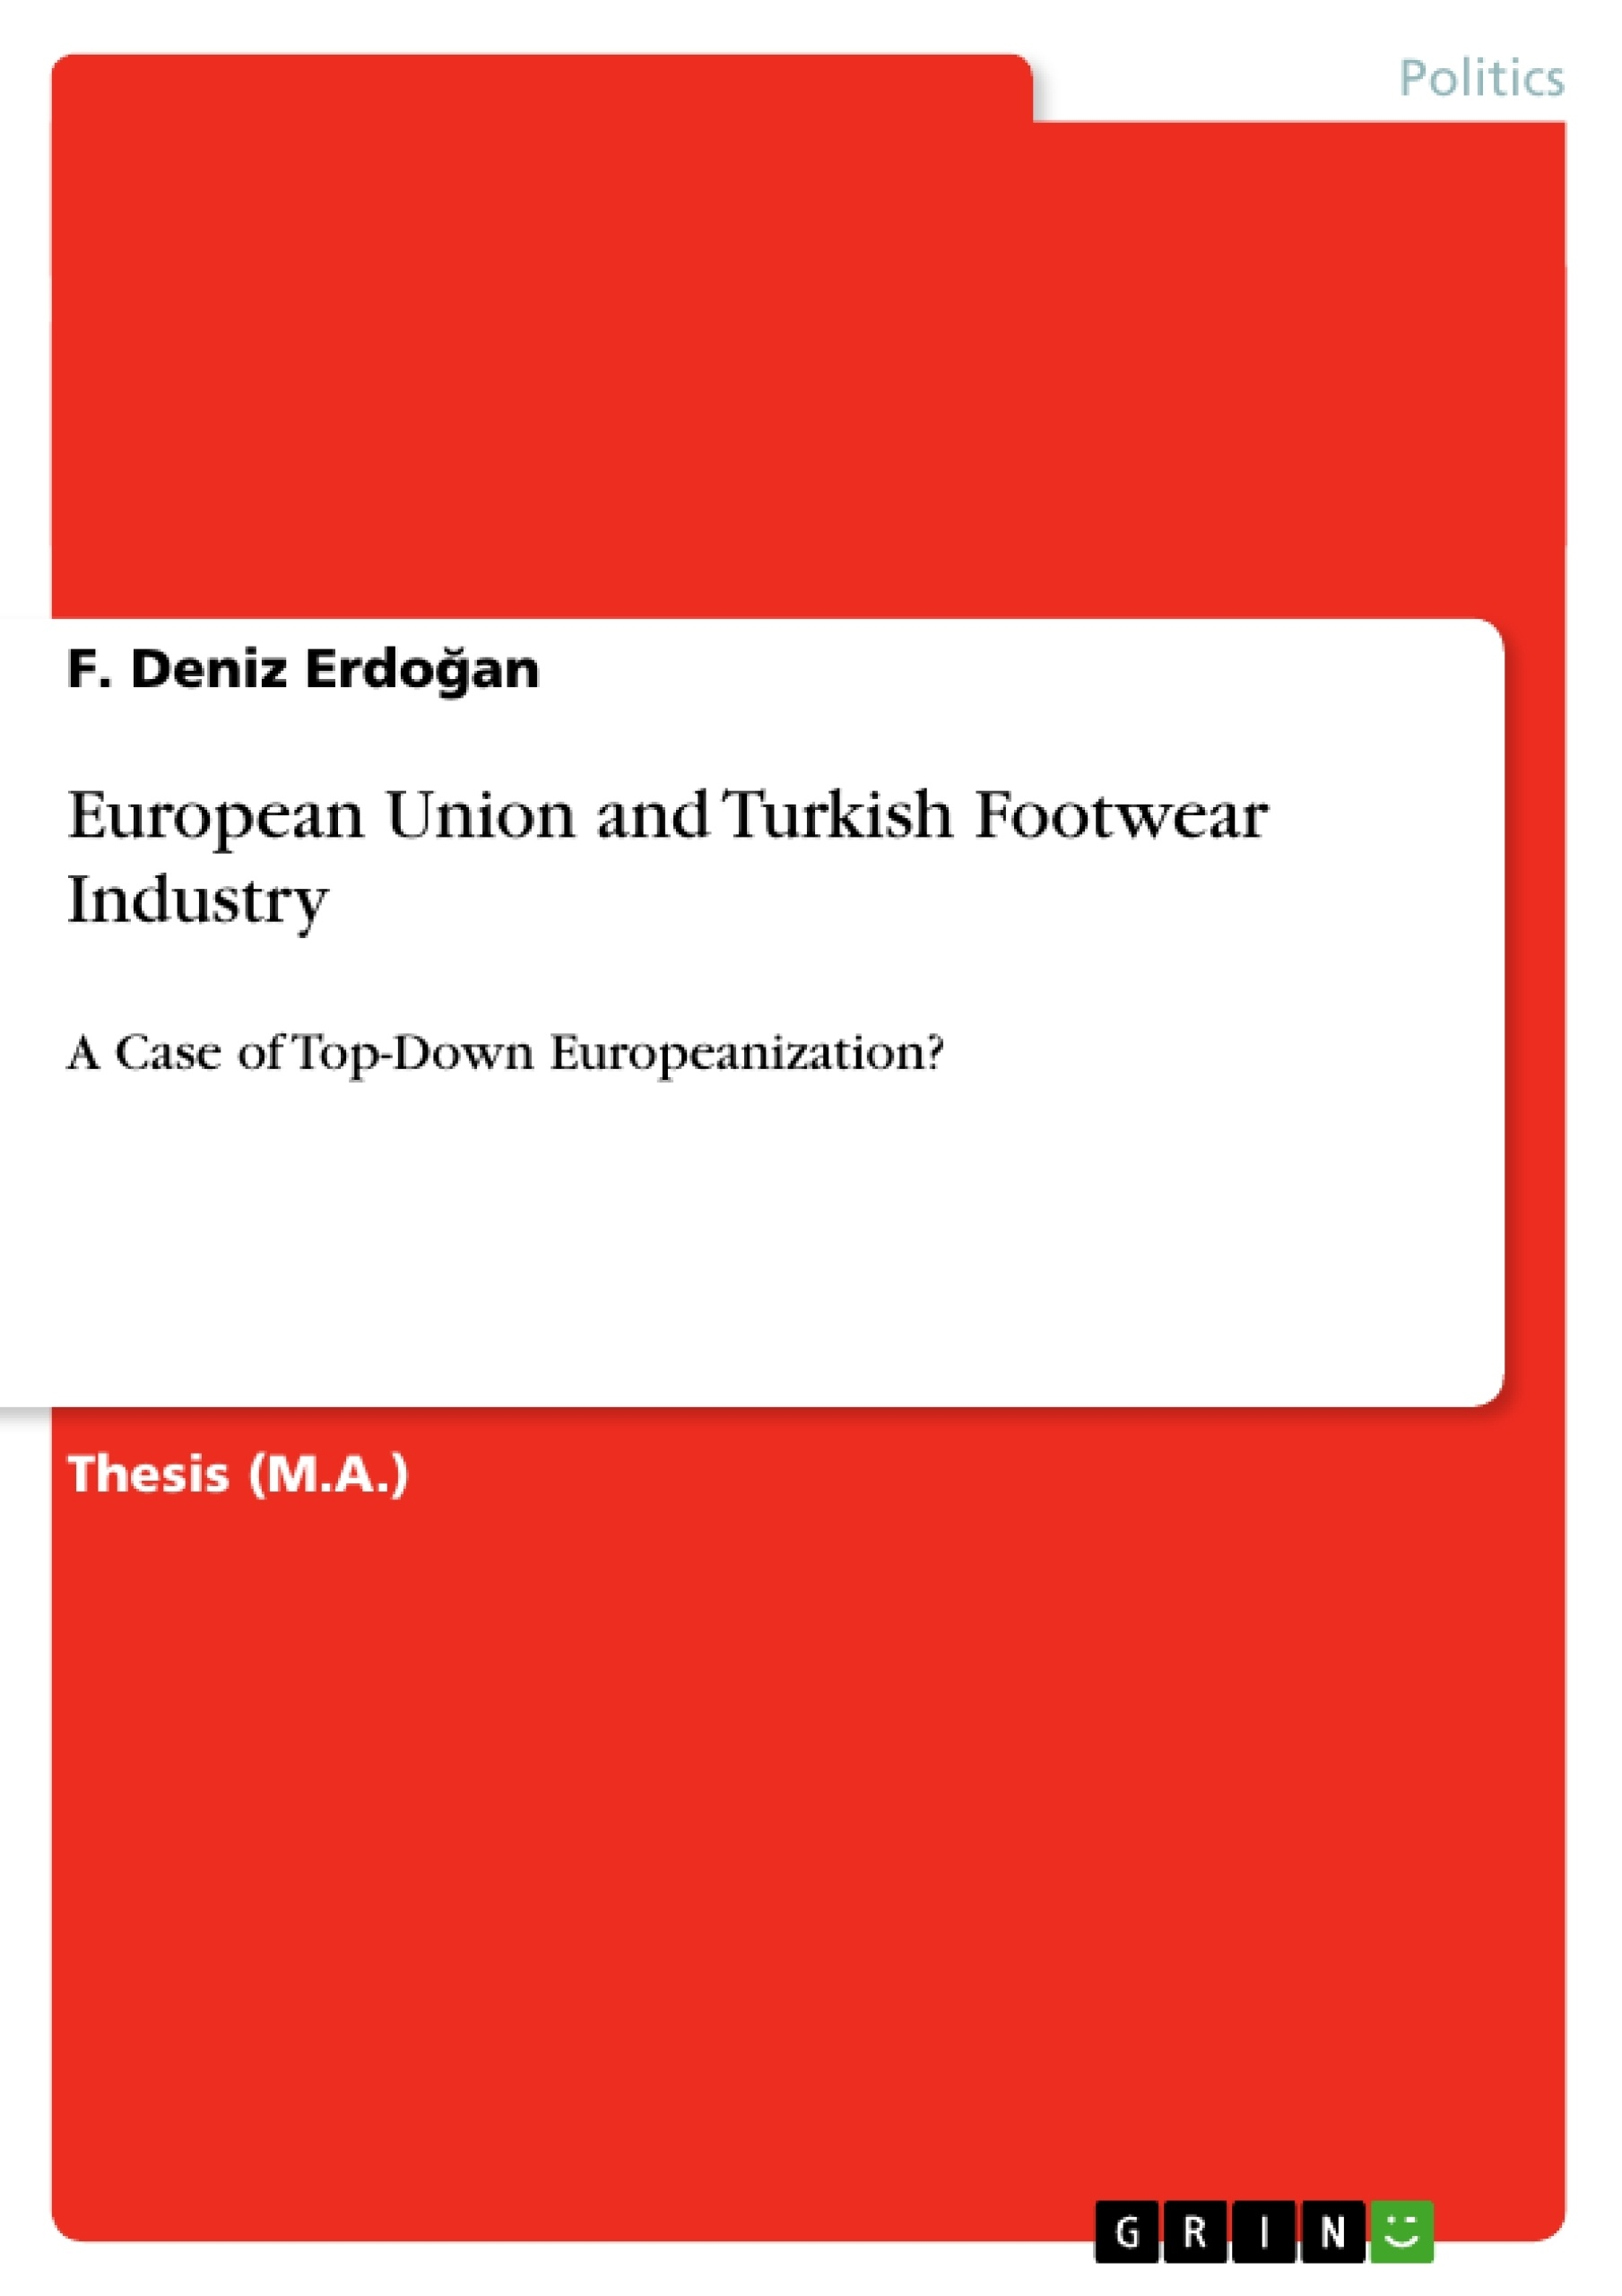 Title: European Union and Turkish Footwear Industry